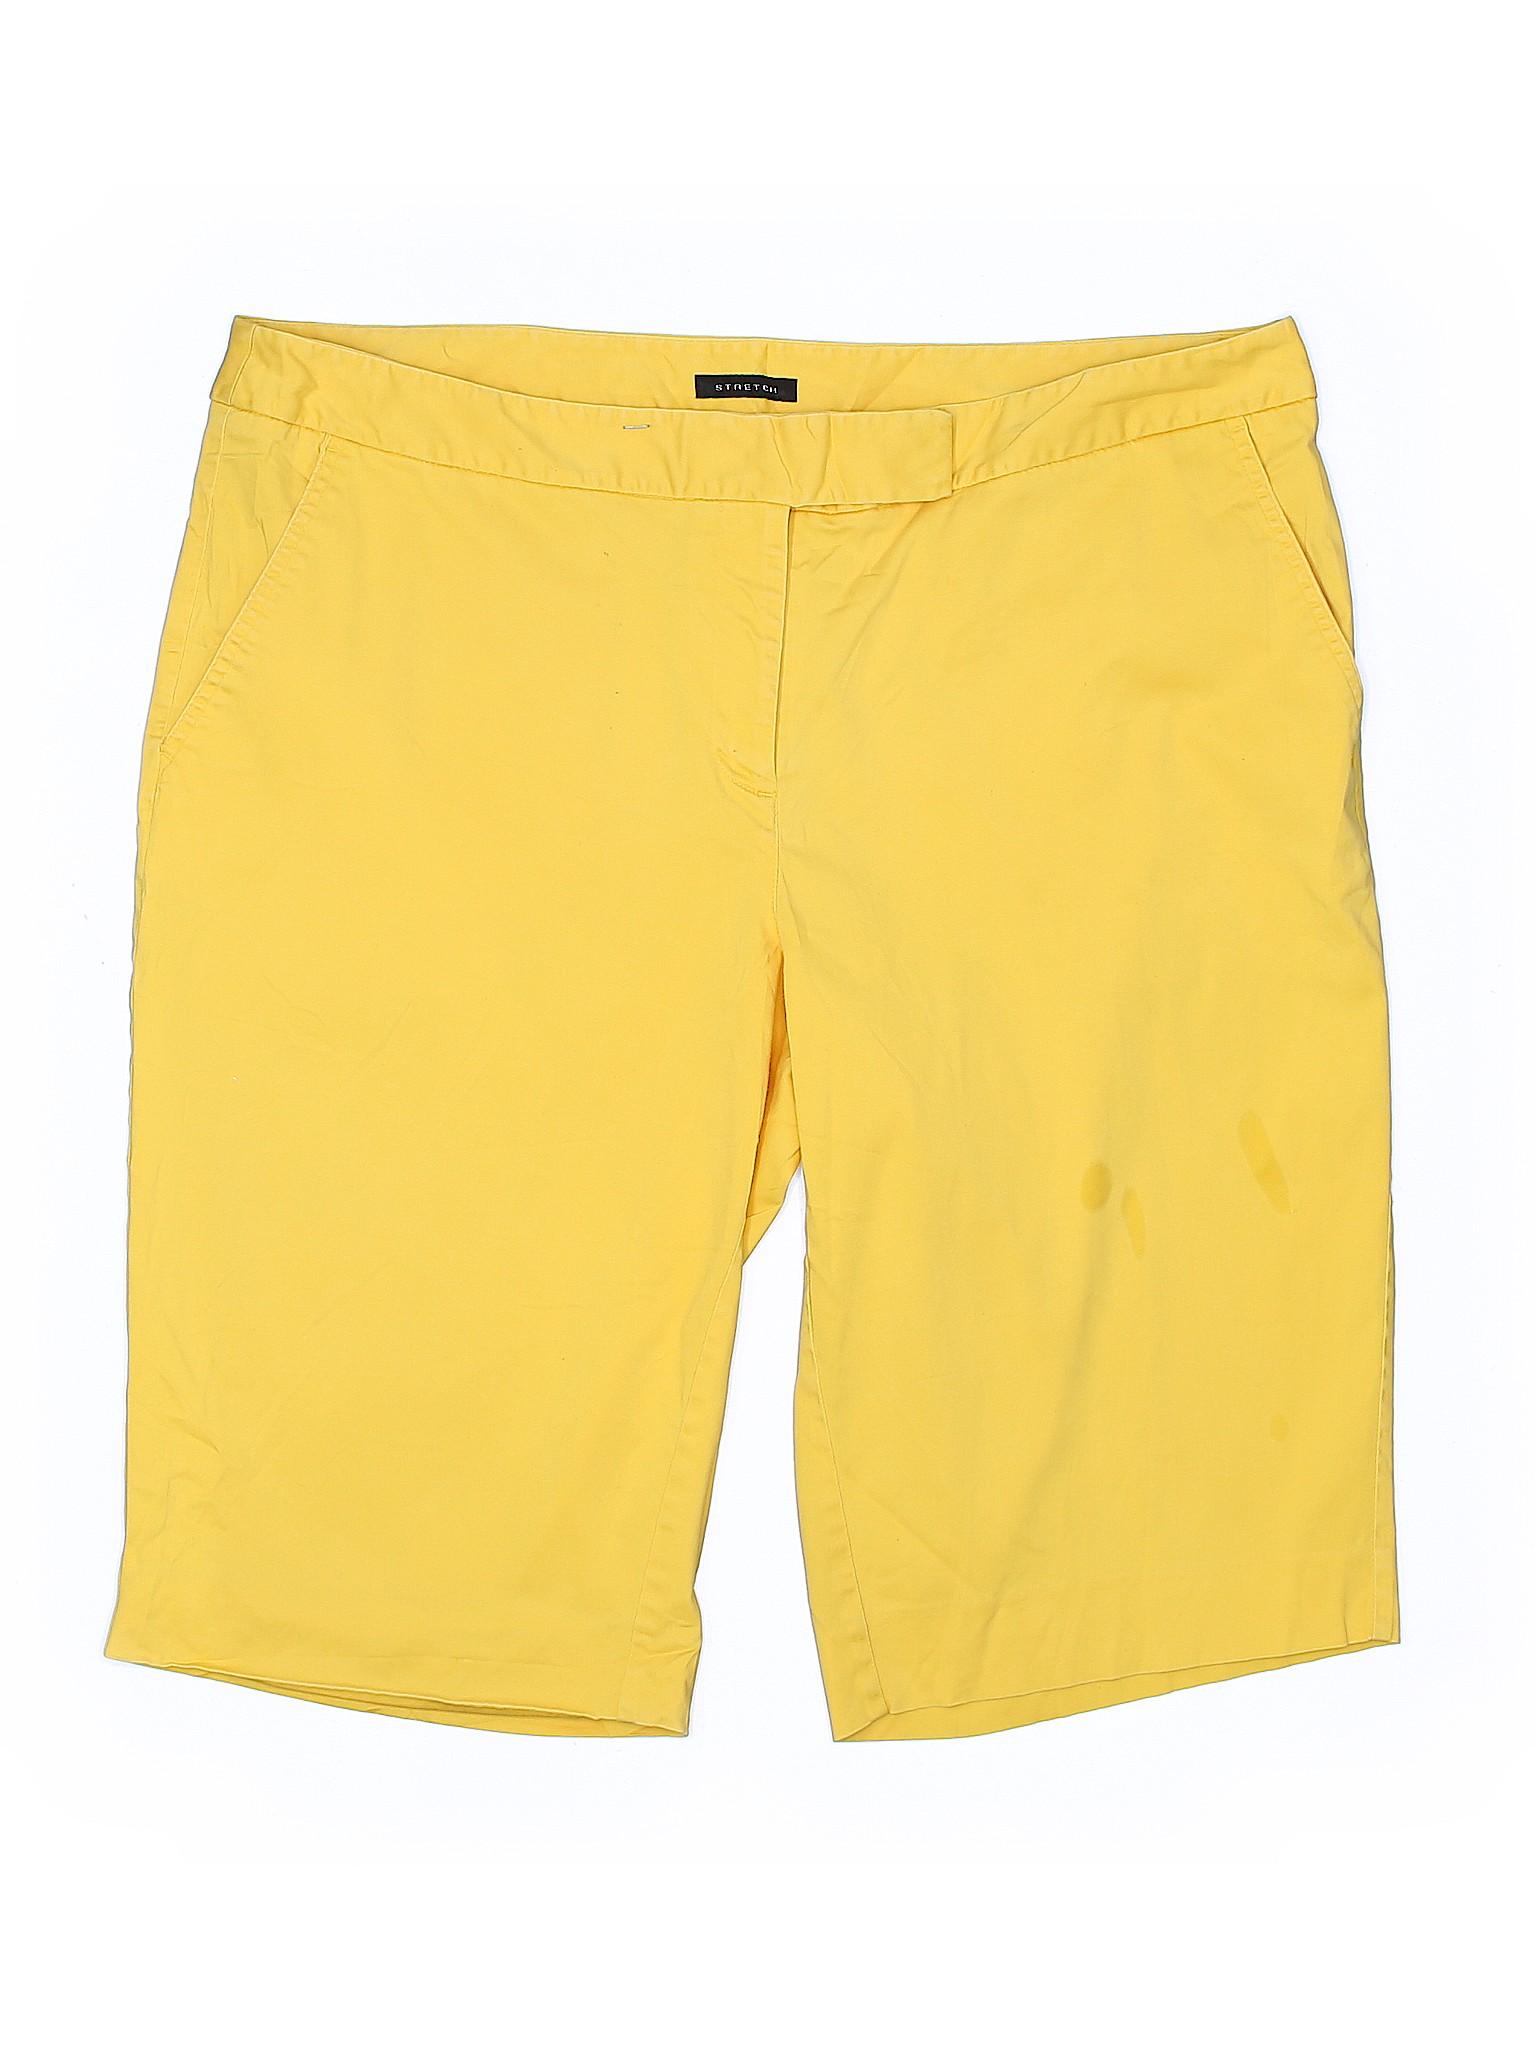 York Boutique Jones Shorts New Khaki Uq0TS6nU